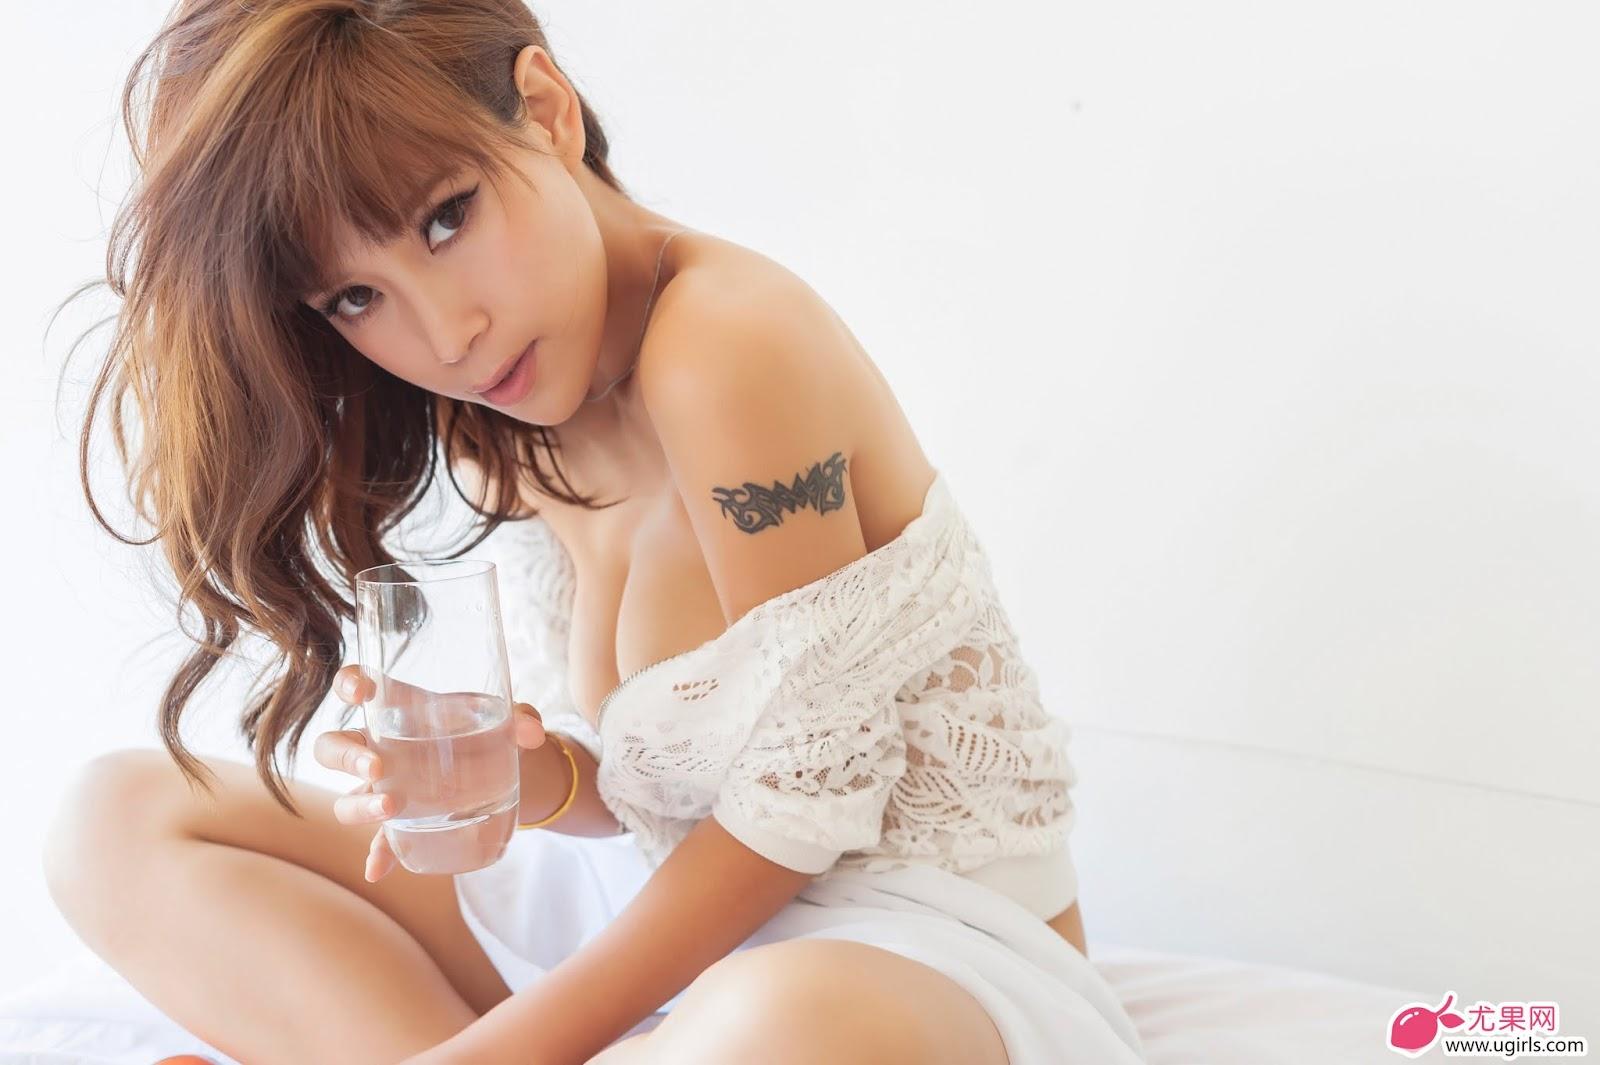 DLS 0334 - Hot Girl Ugirls No.021 Model: 田依依